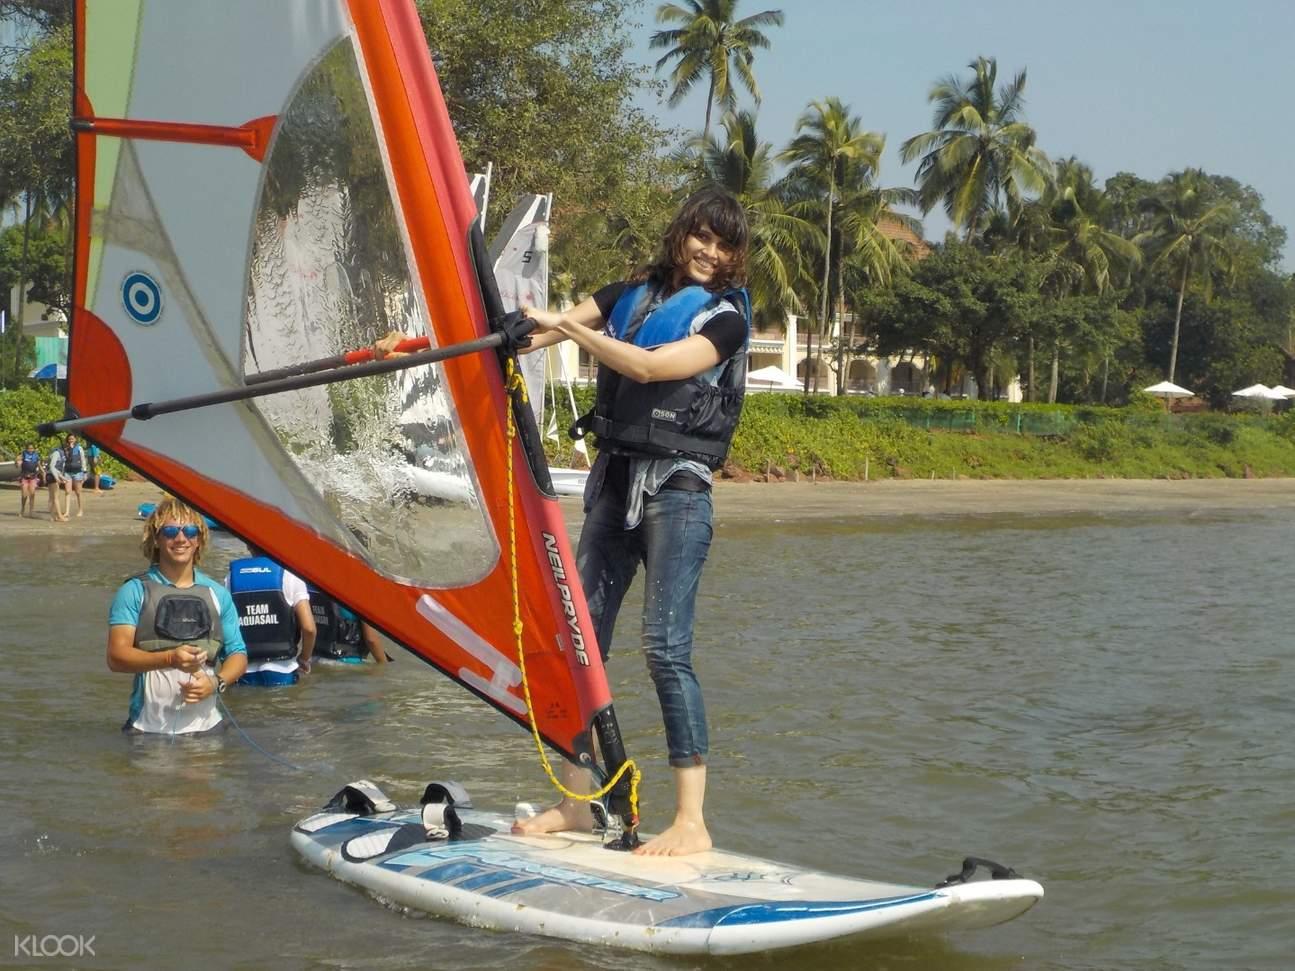 tourist try windsurfing in goa